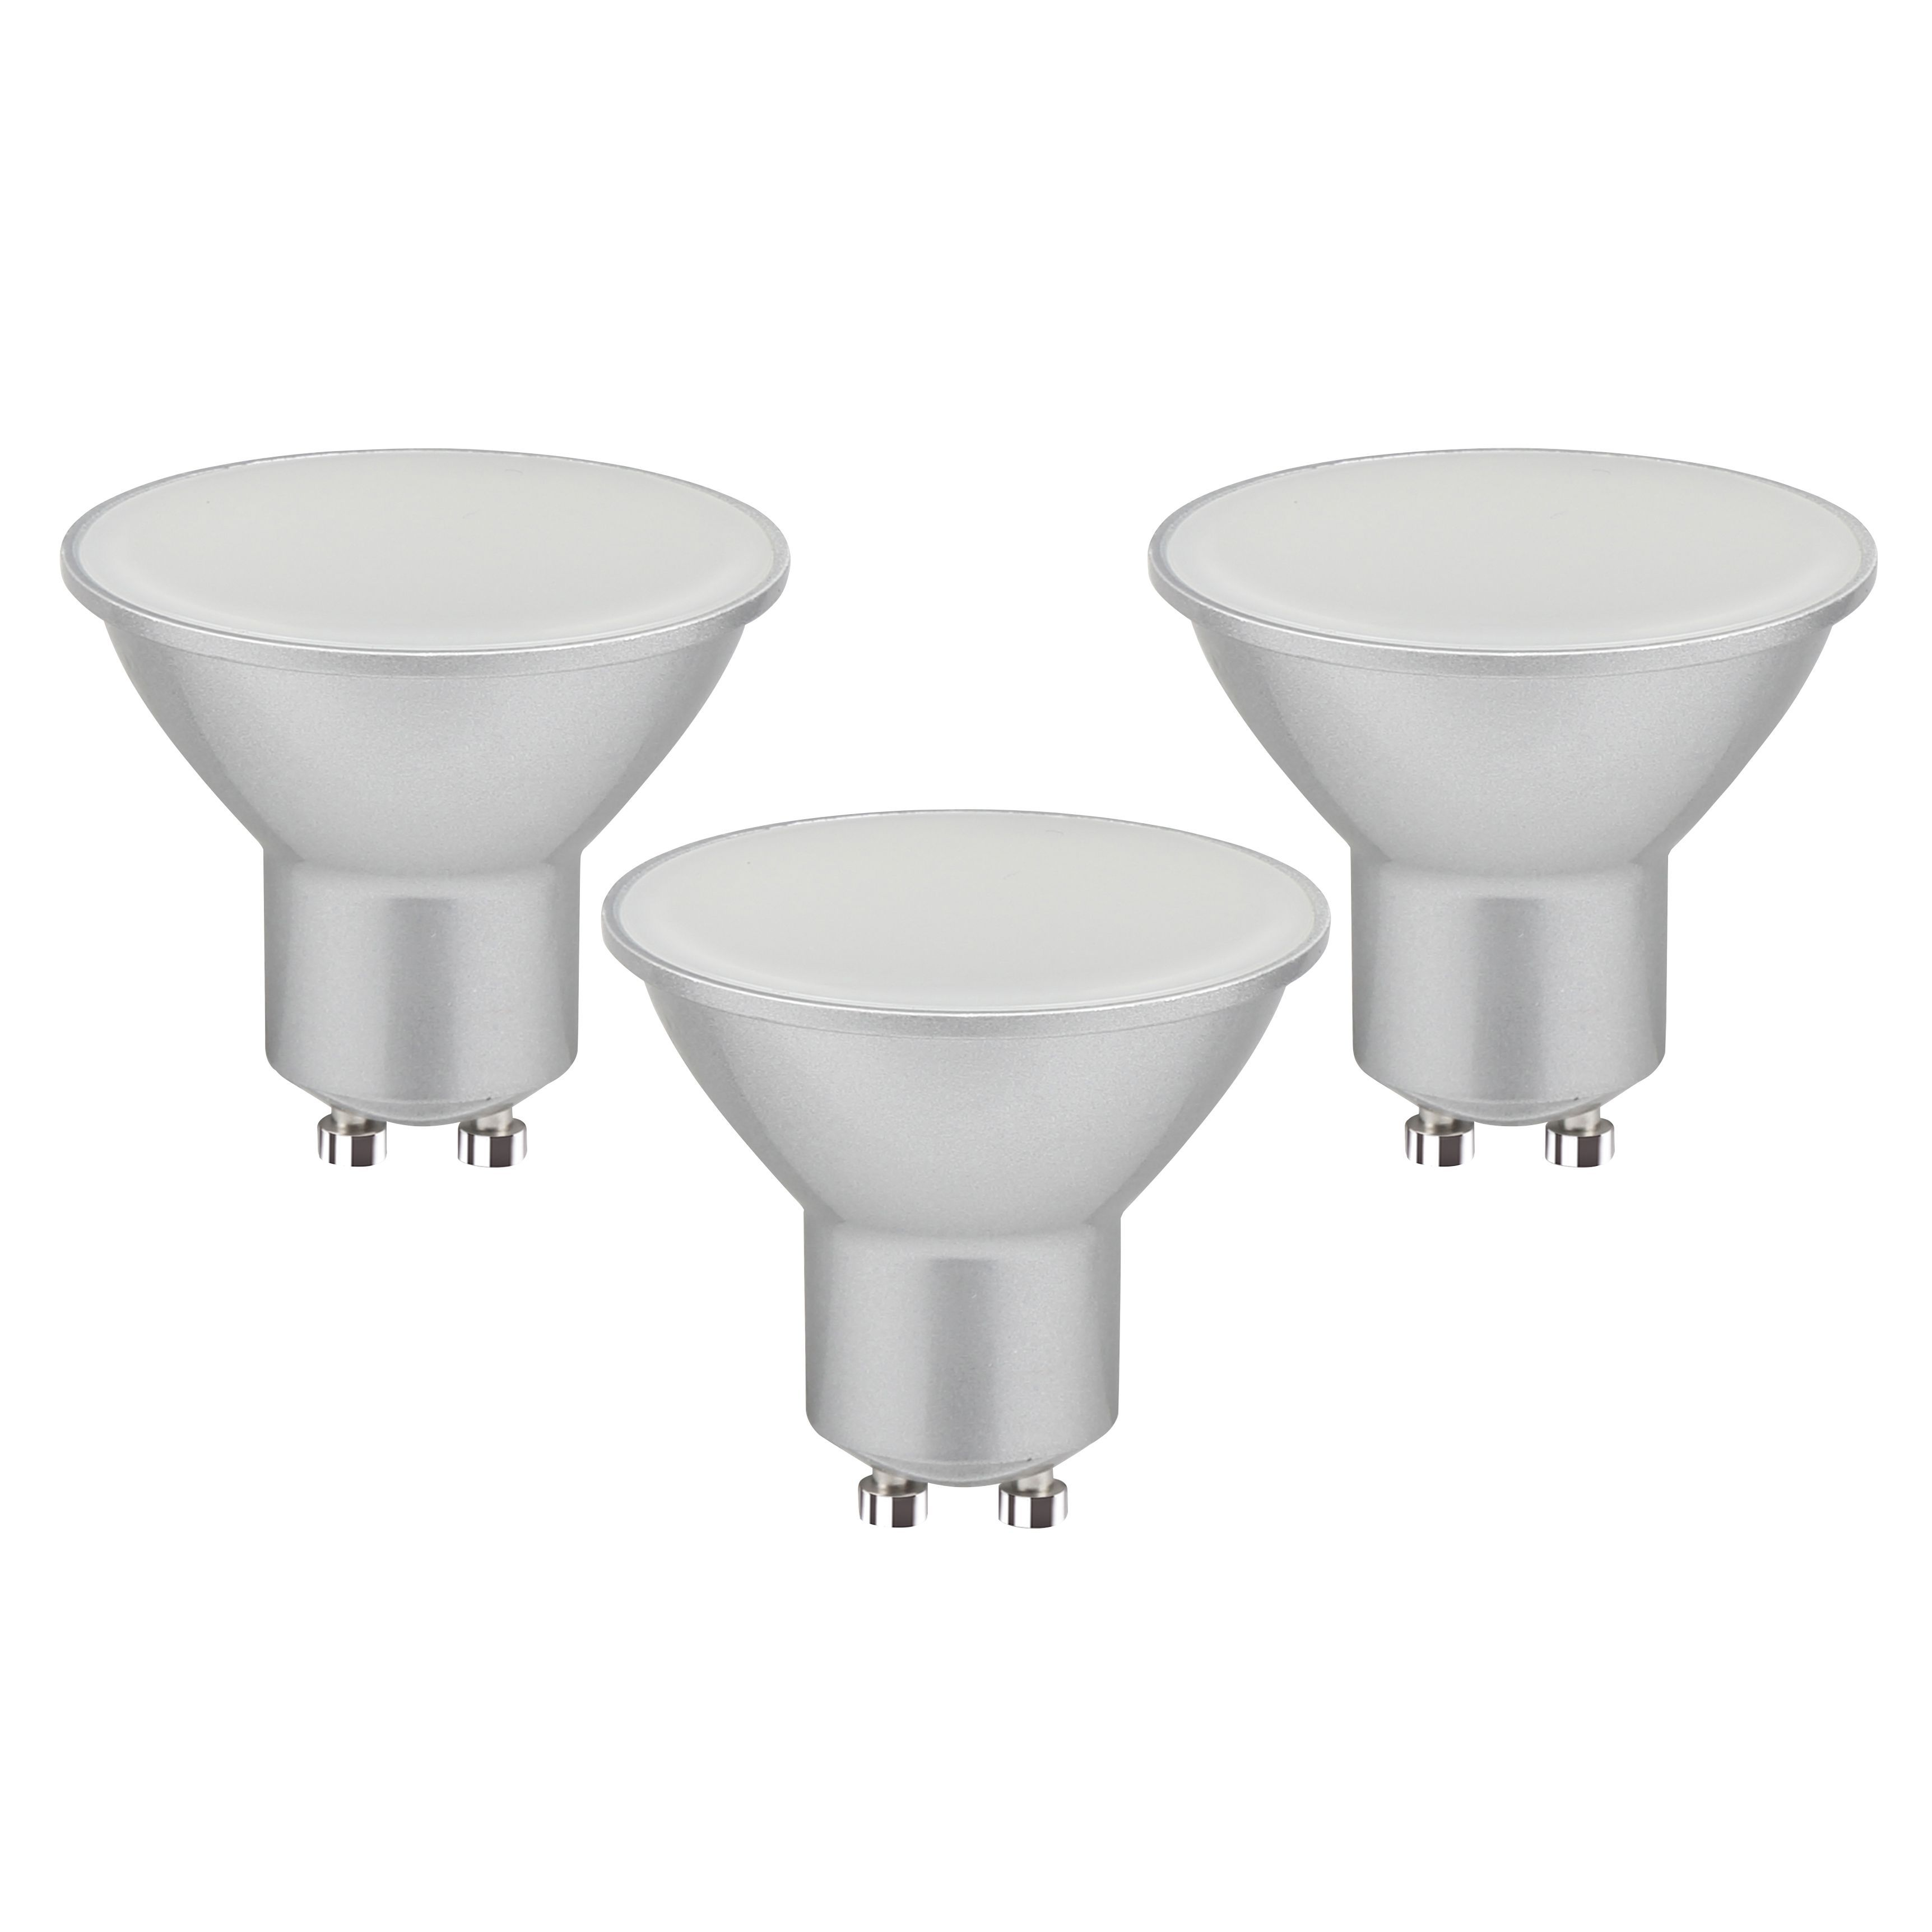 Diall Gu10 340lm Led Reflector Light Bulb, Pack Of 3